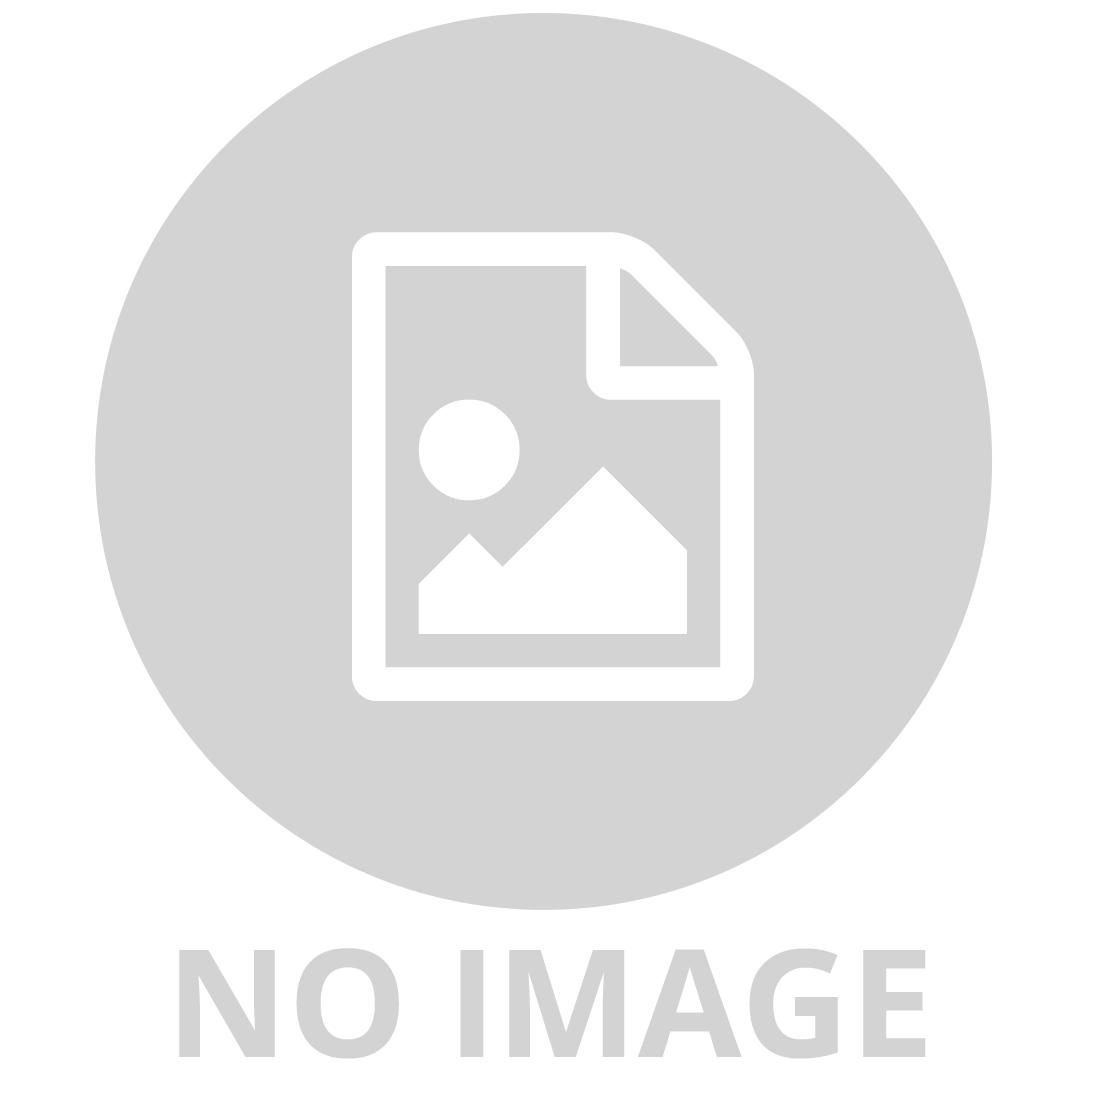 MININATUR STRIPS OF GRASS LONG EARLY AUTUMN